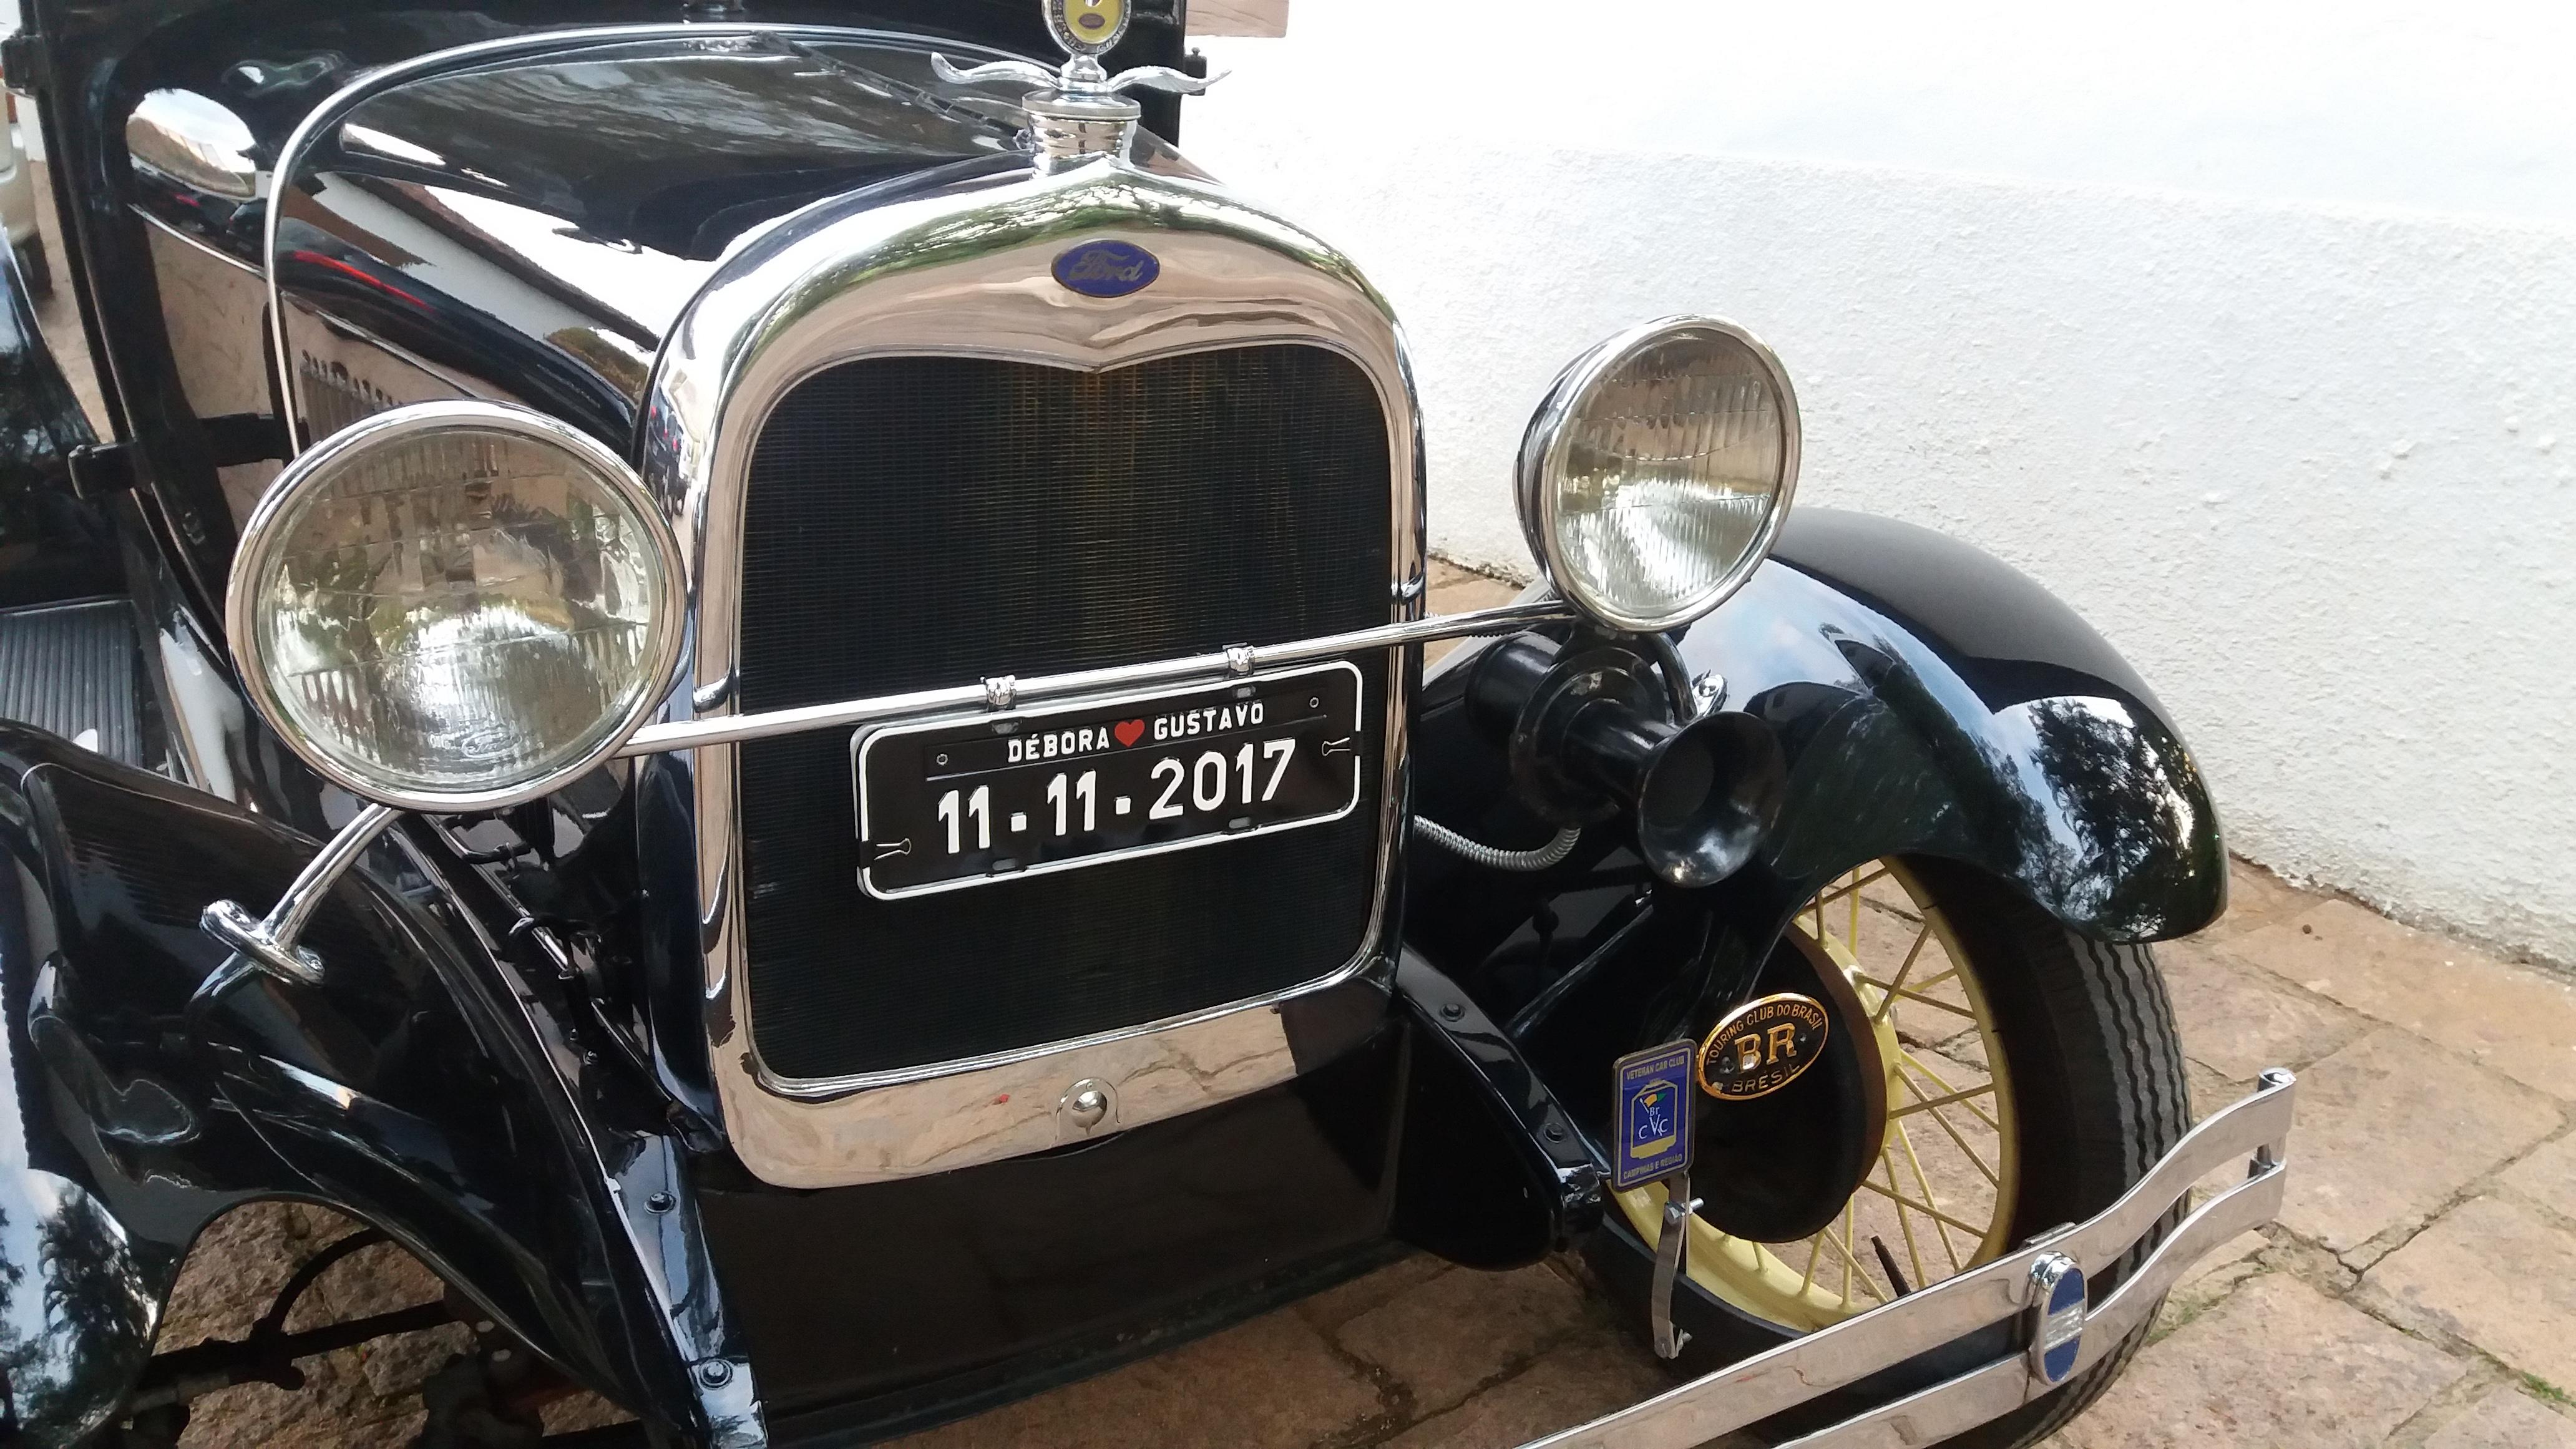 20171111_191818